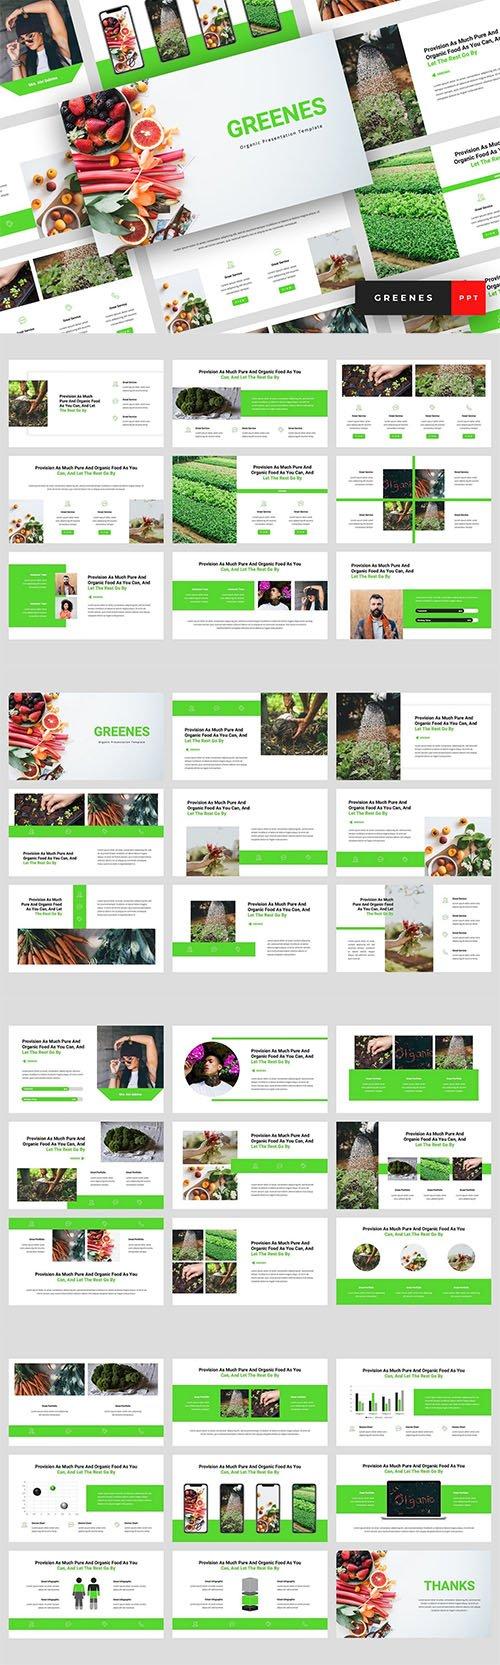 Greenes - Organic Powerpoint Google Slides and Keynote ...